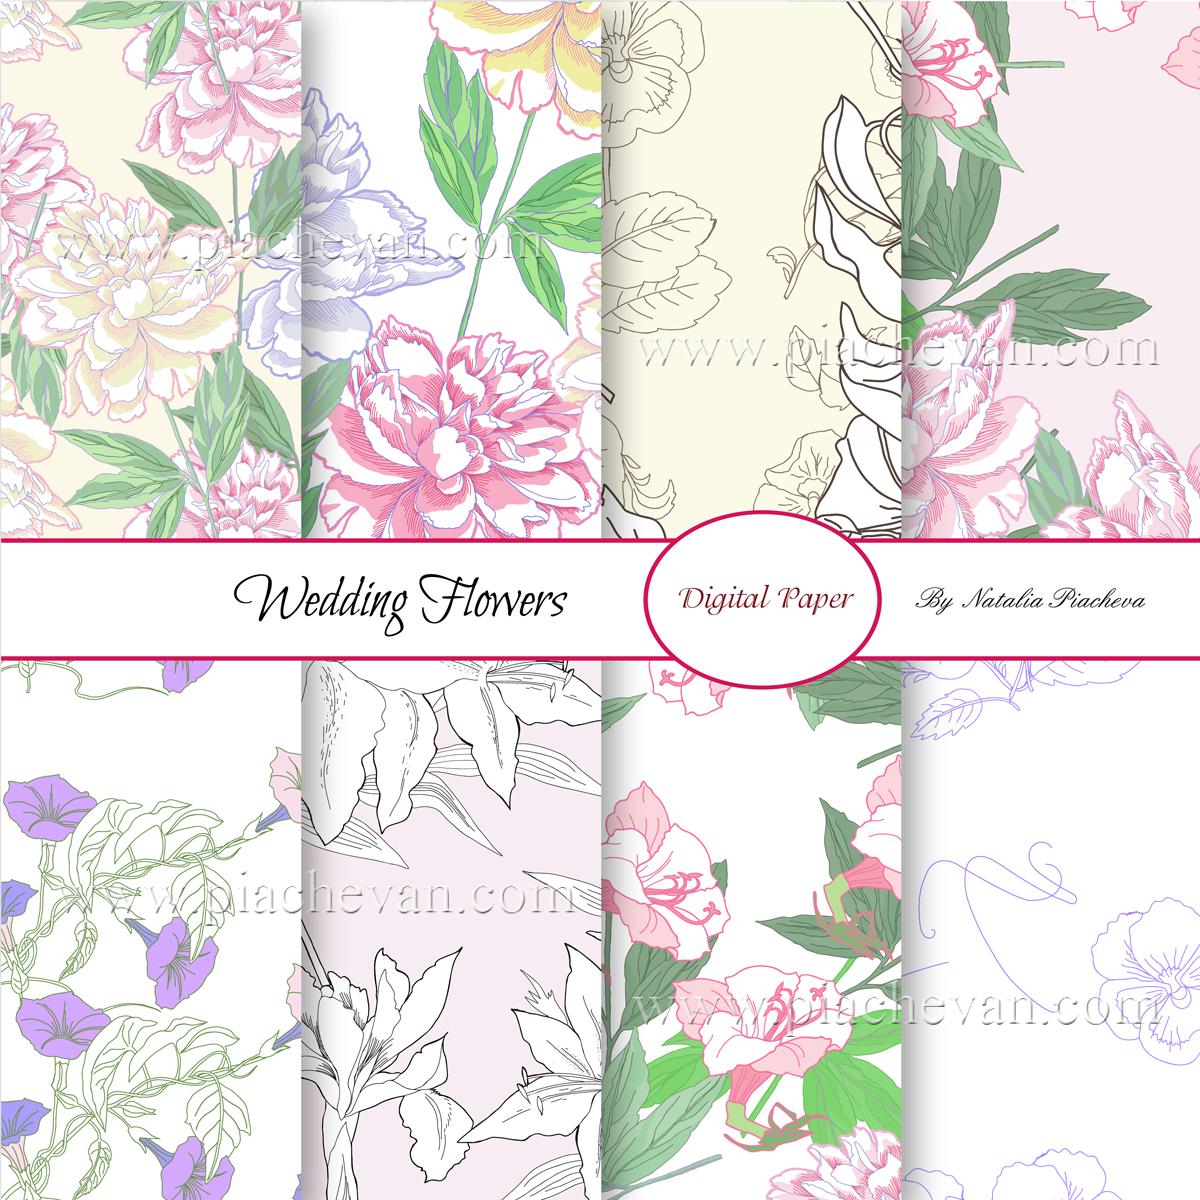 Wedding Flowers.Digital Paper example image 4